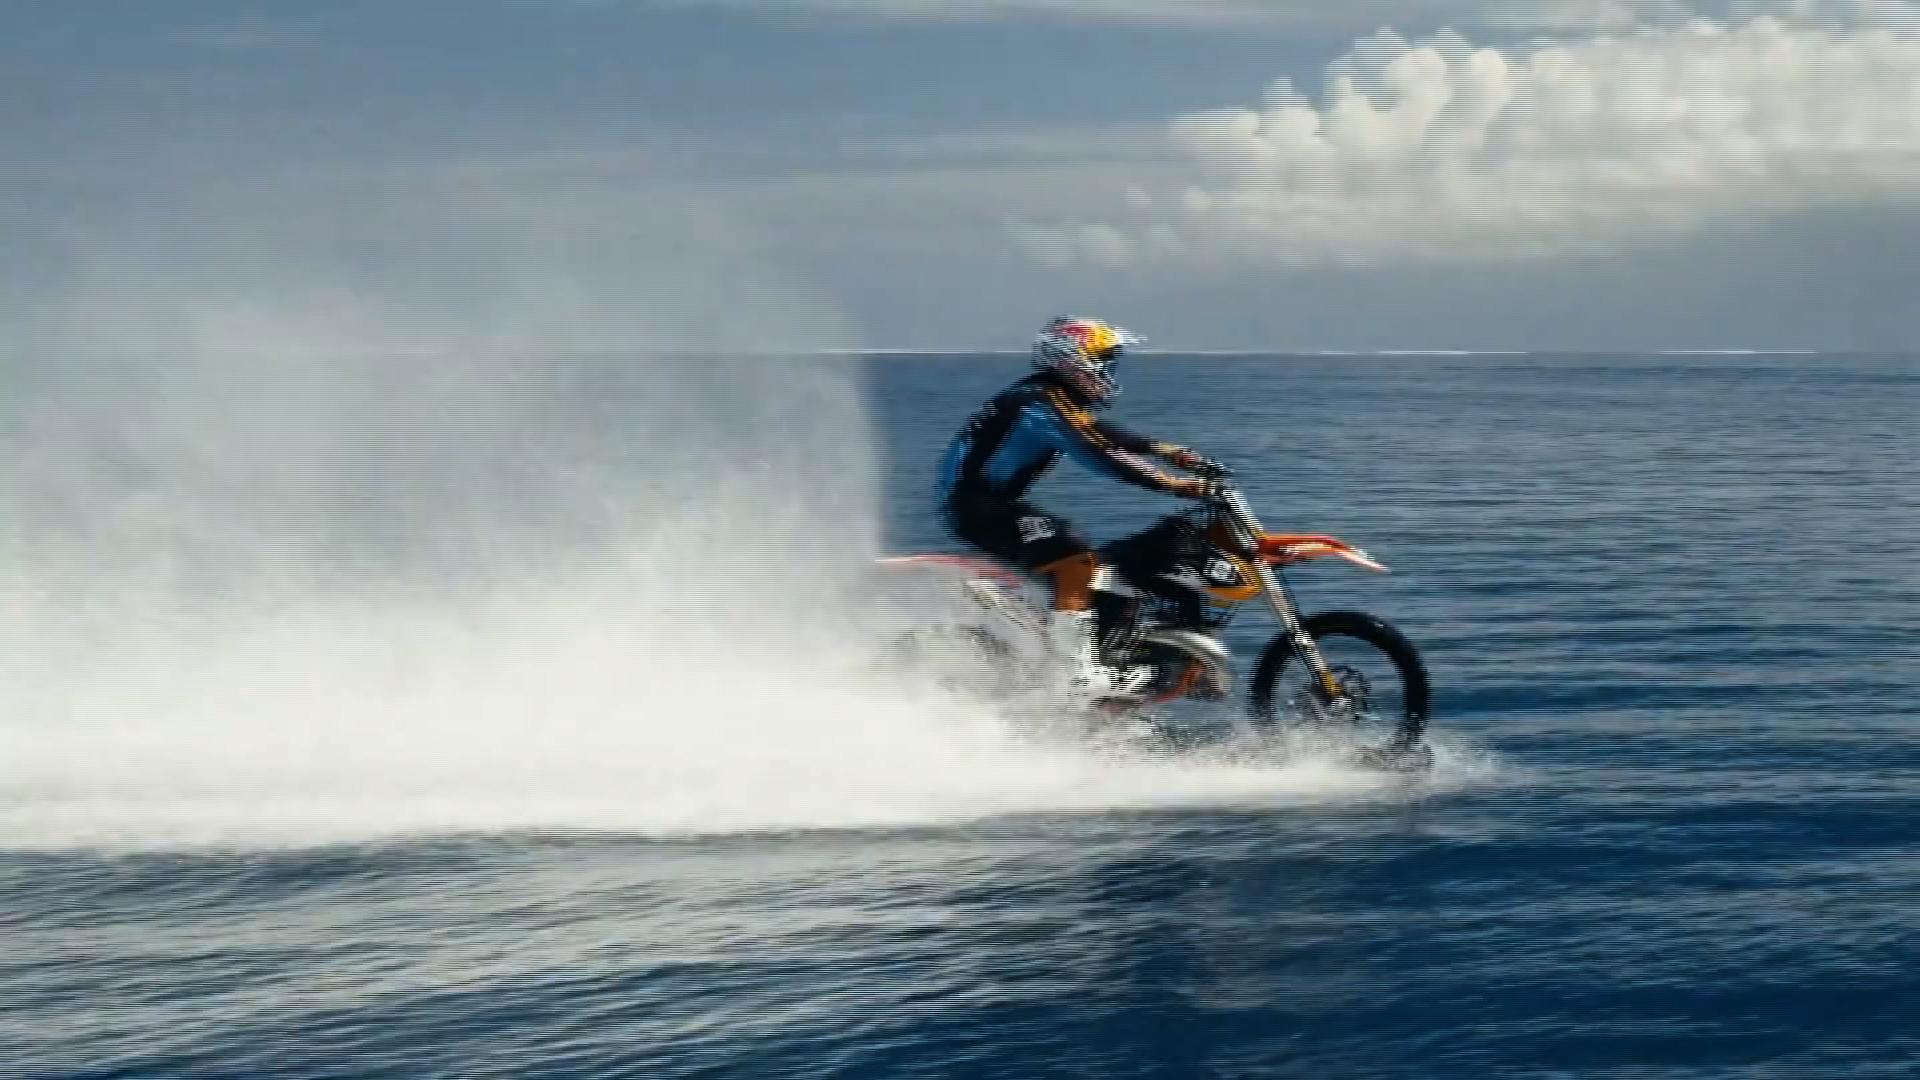 380ab91a19936 Motocross star surfs big waves on his bike - CNN Video